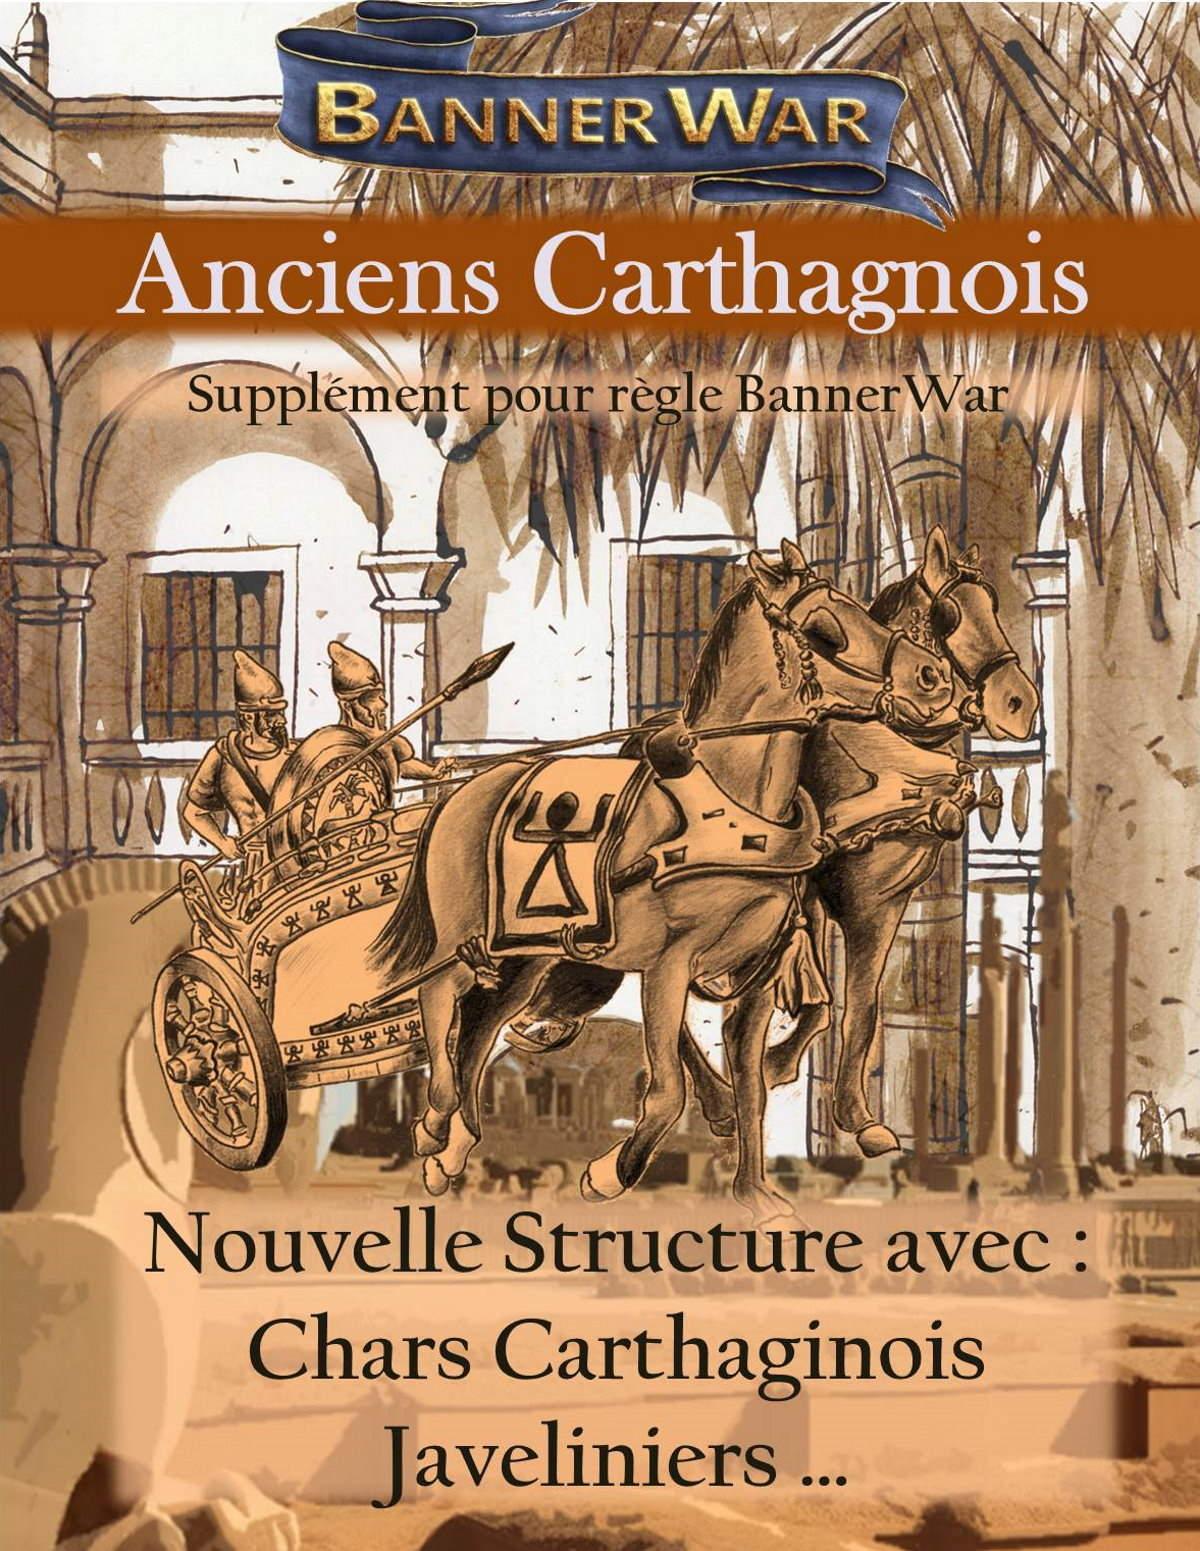 Chars carthaginois